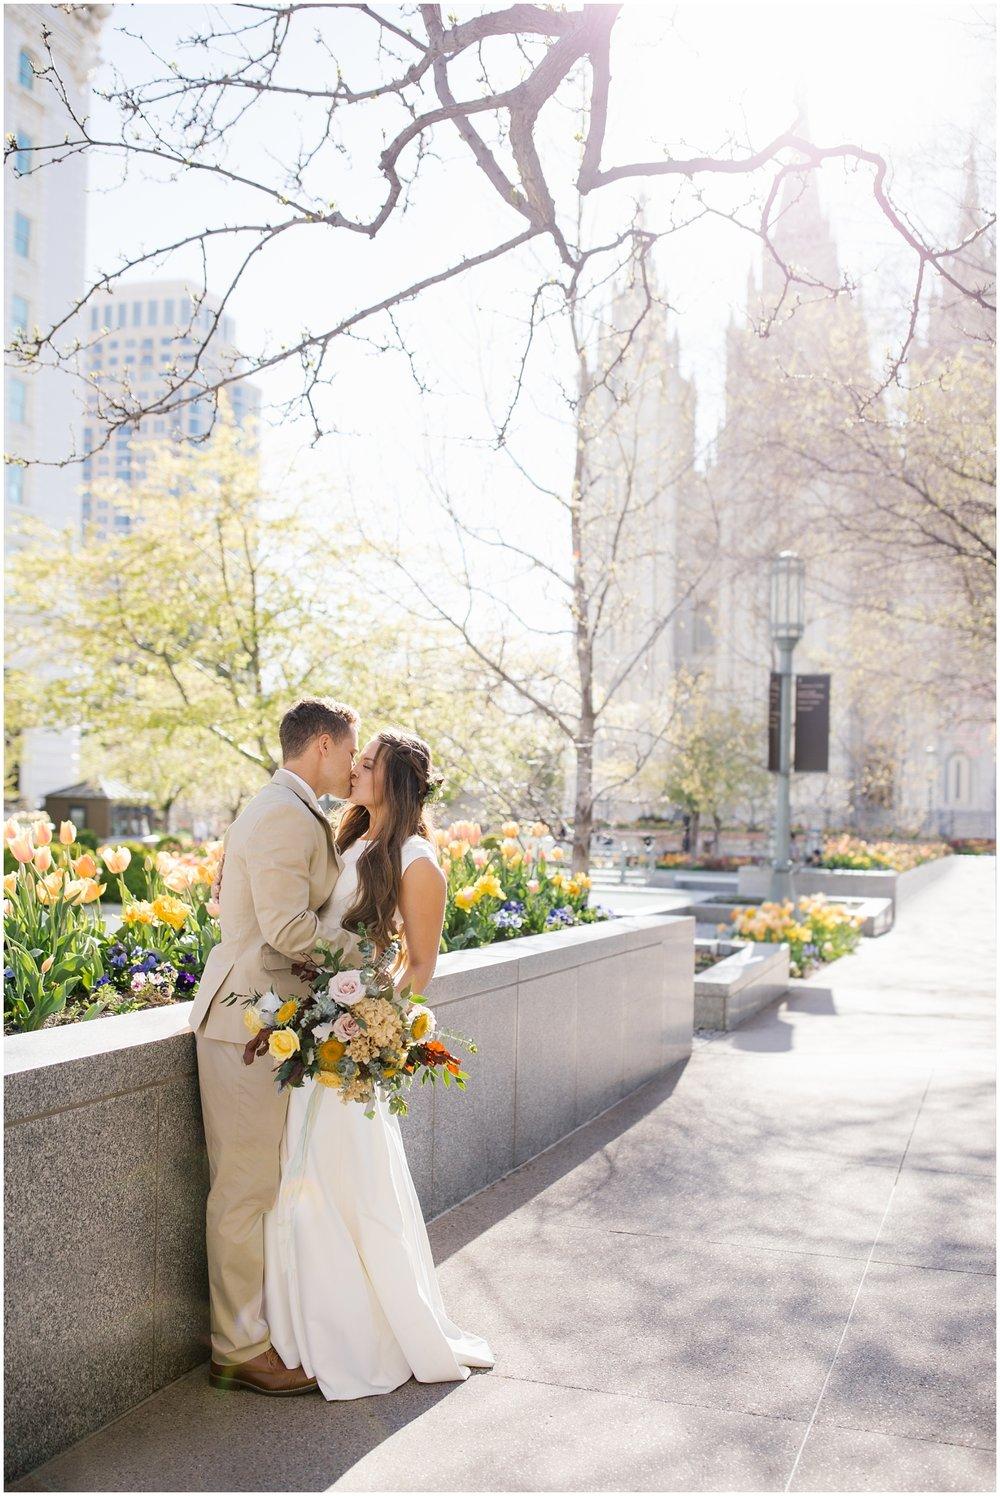 JC-Wedding-239_Lizzie-B-Imagery-Utah-Wedding-Photographer-Park-City-Salt-Lake-City-Temple-Joseph-Smith-Memorial-Building-Empire-Room.jpg